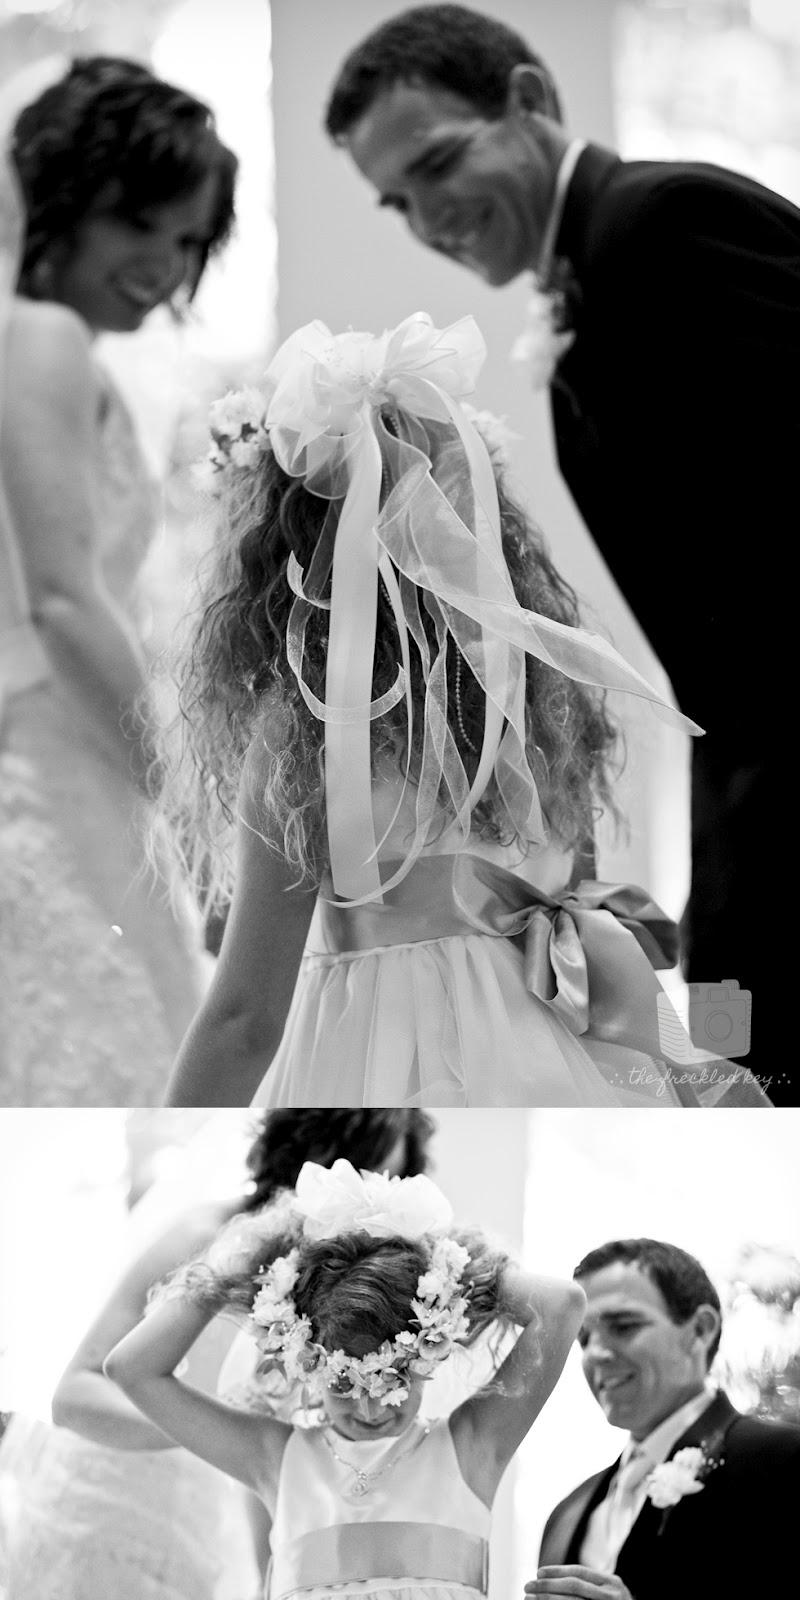 Amanda + Josh | 06 02 2012 | Houston Wedding Photographer - The